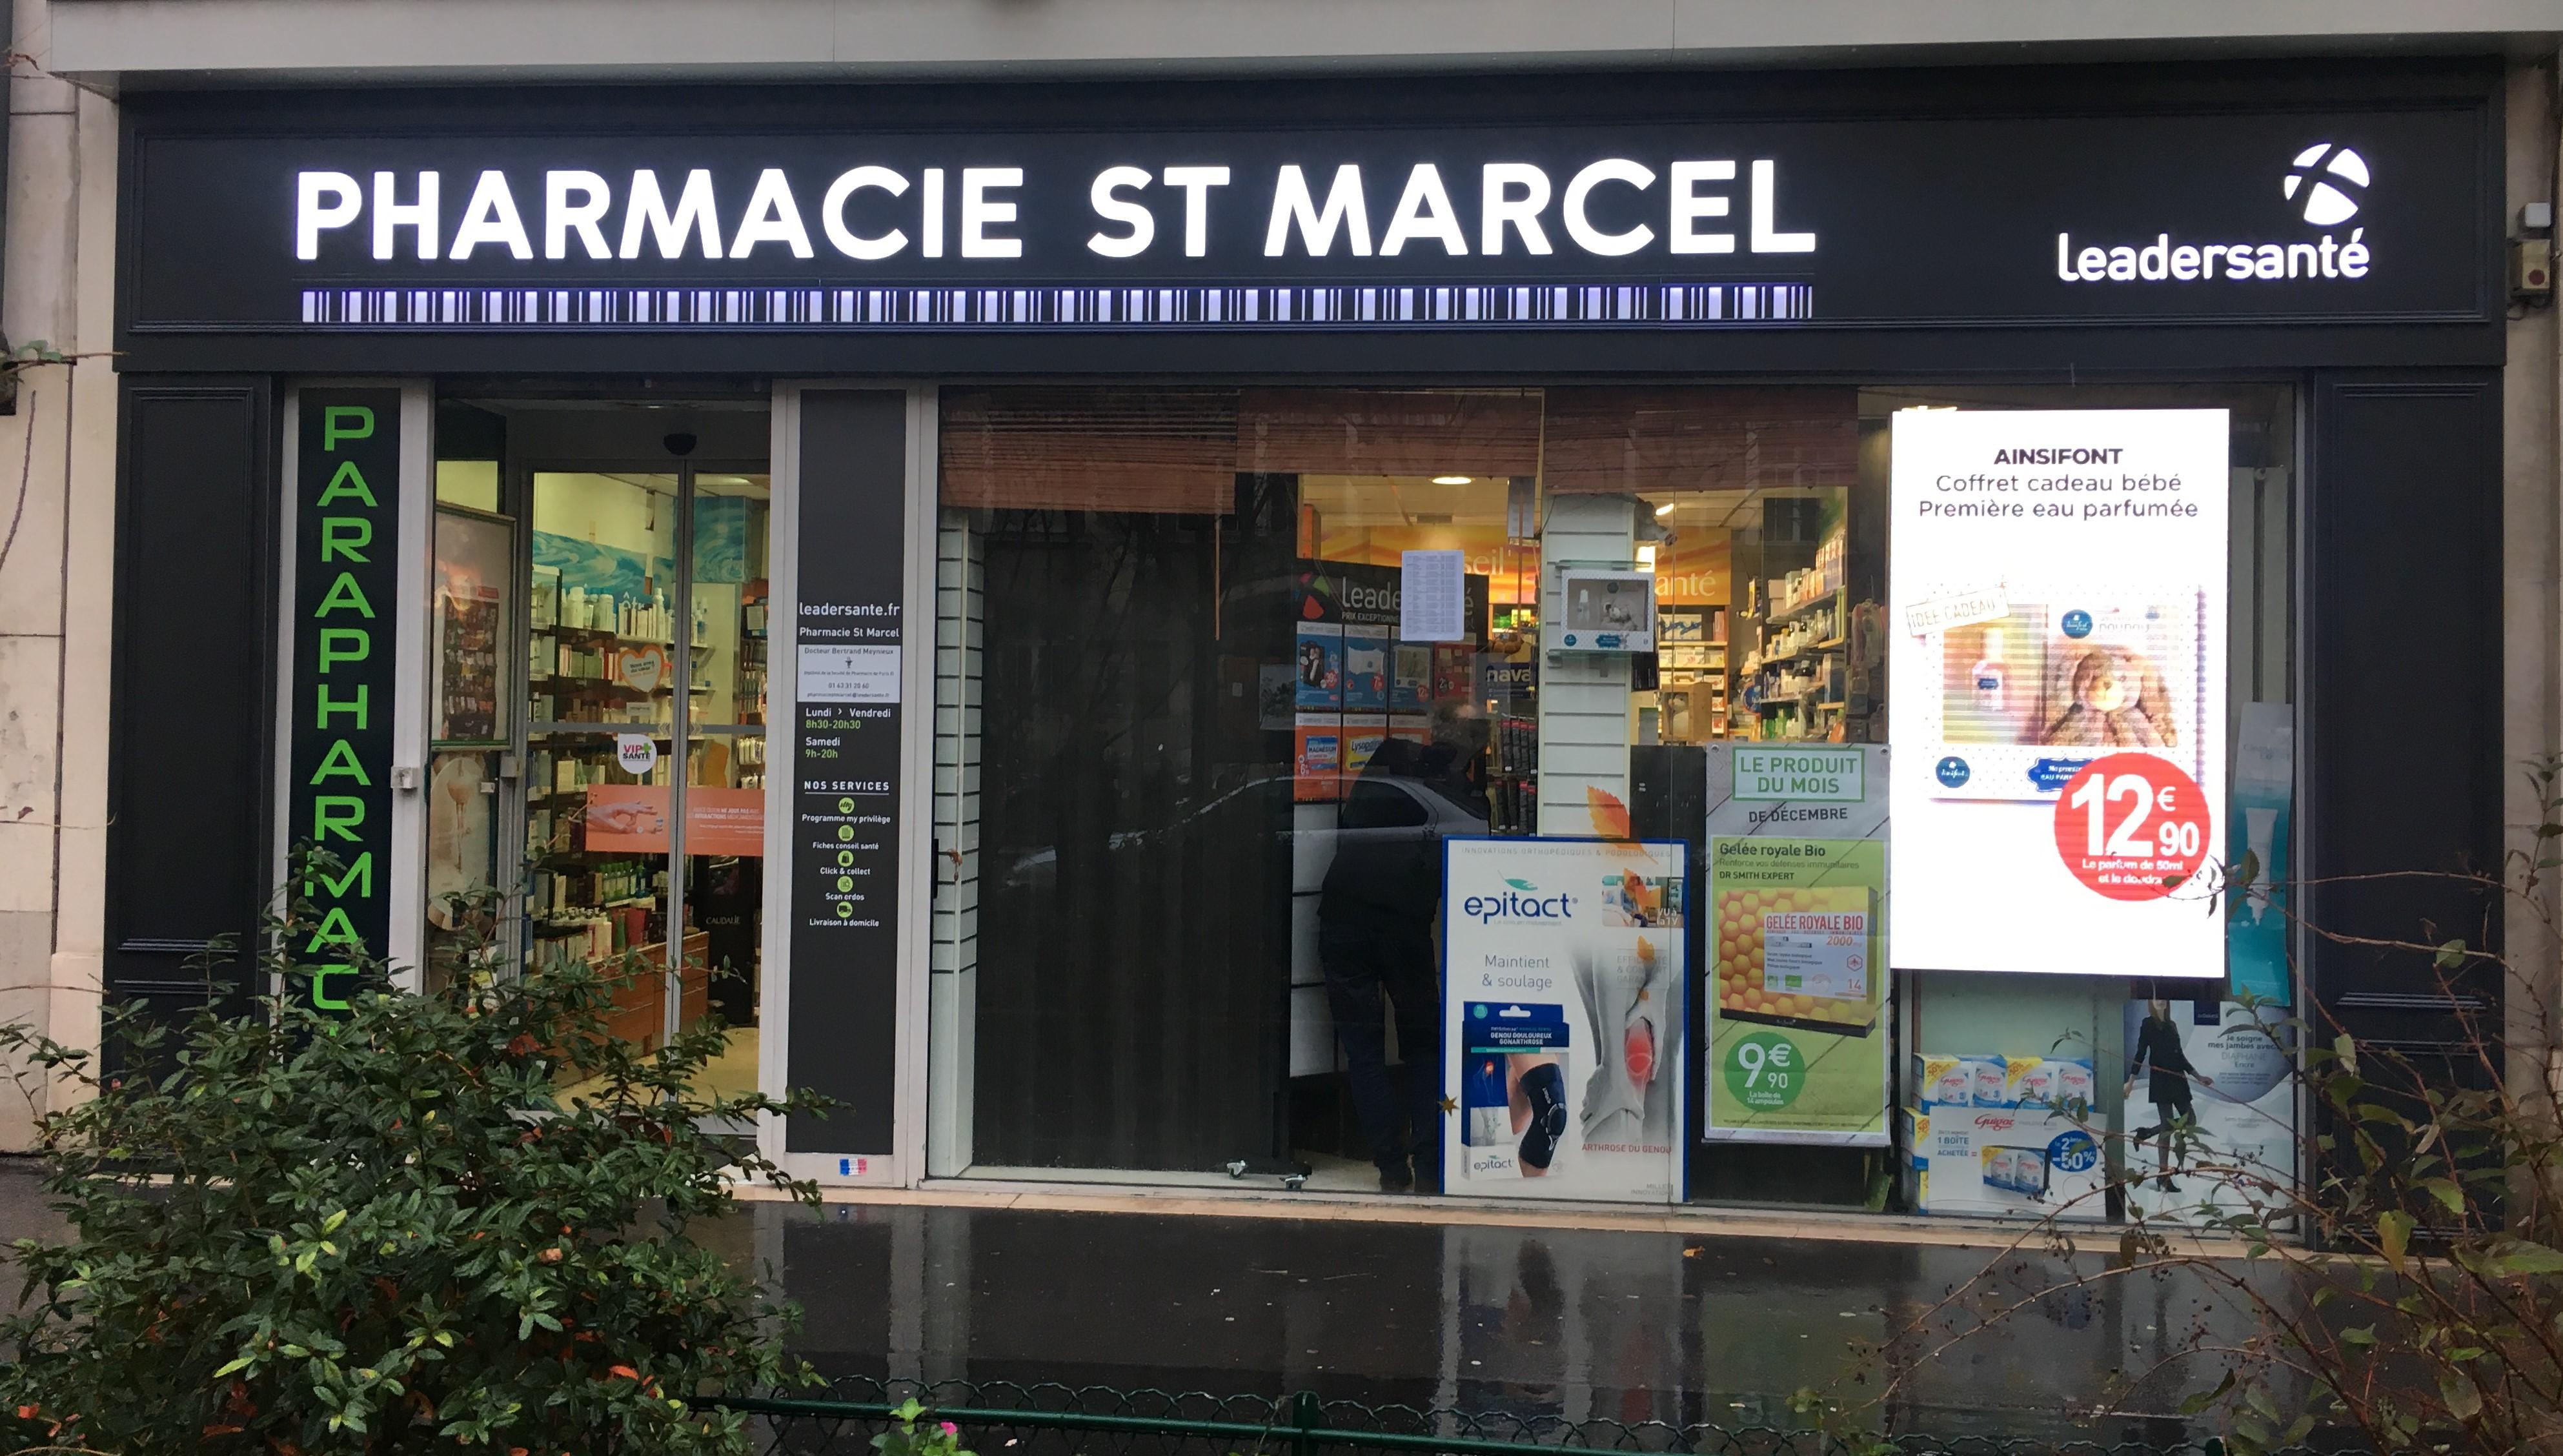 Pharmacie saint Marcel